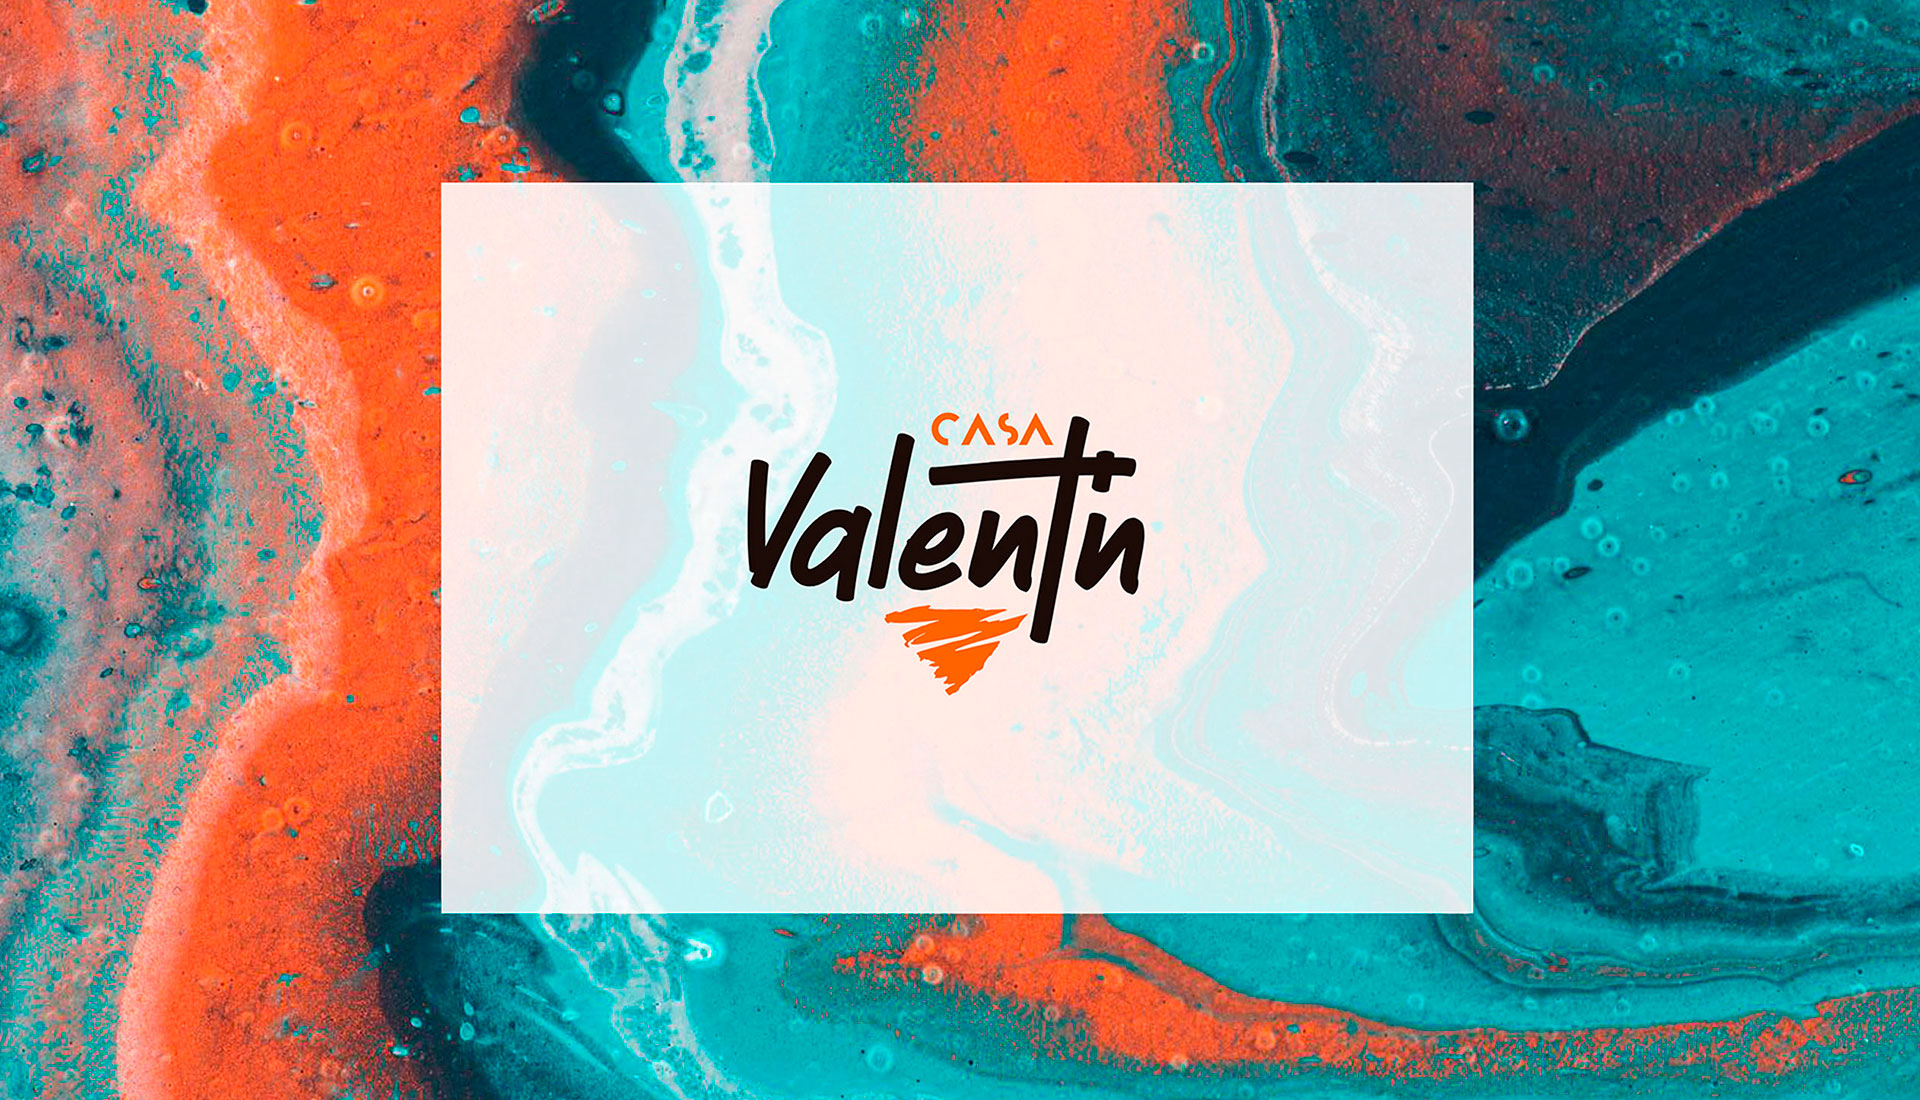 agencia-marketing-digital-pennyworth-identidad-corporativa-restaurante-valencia-01